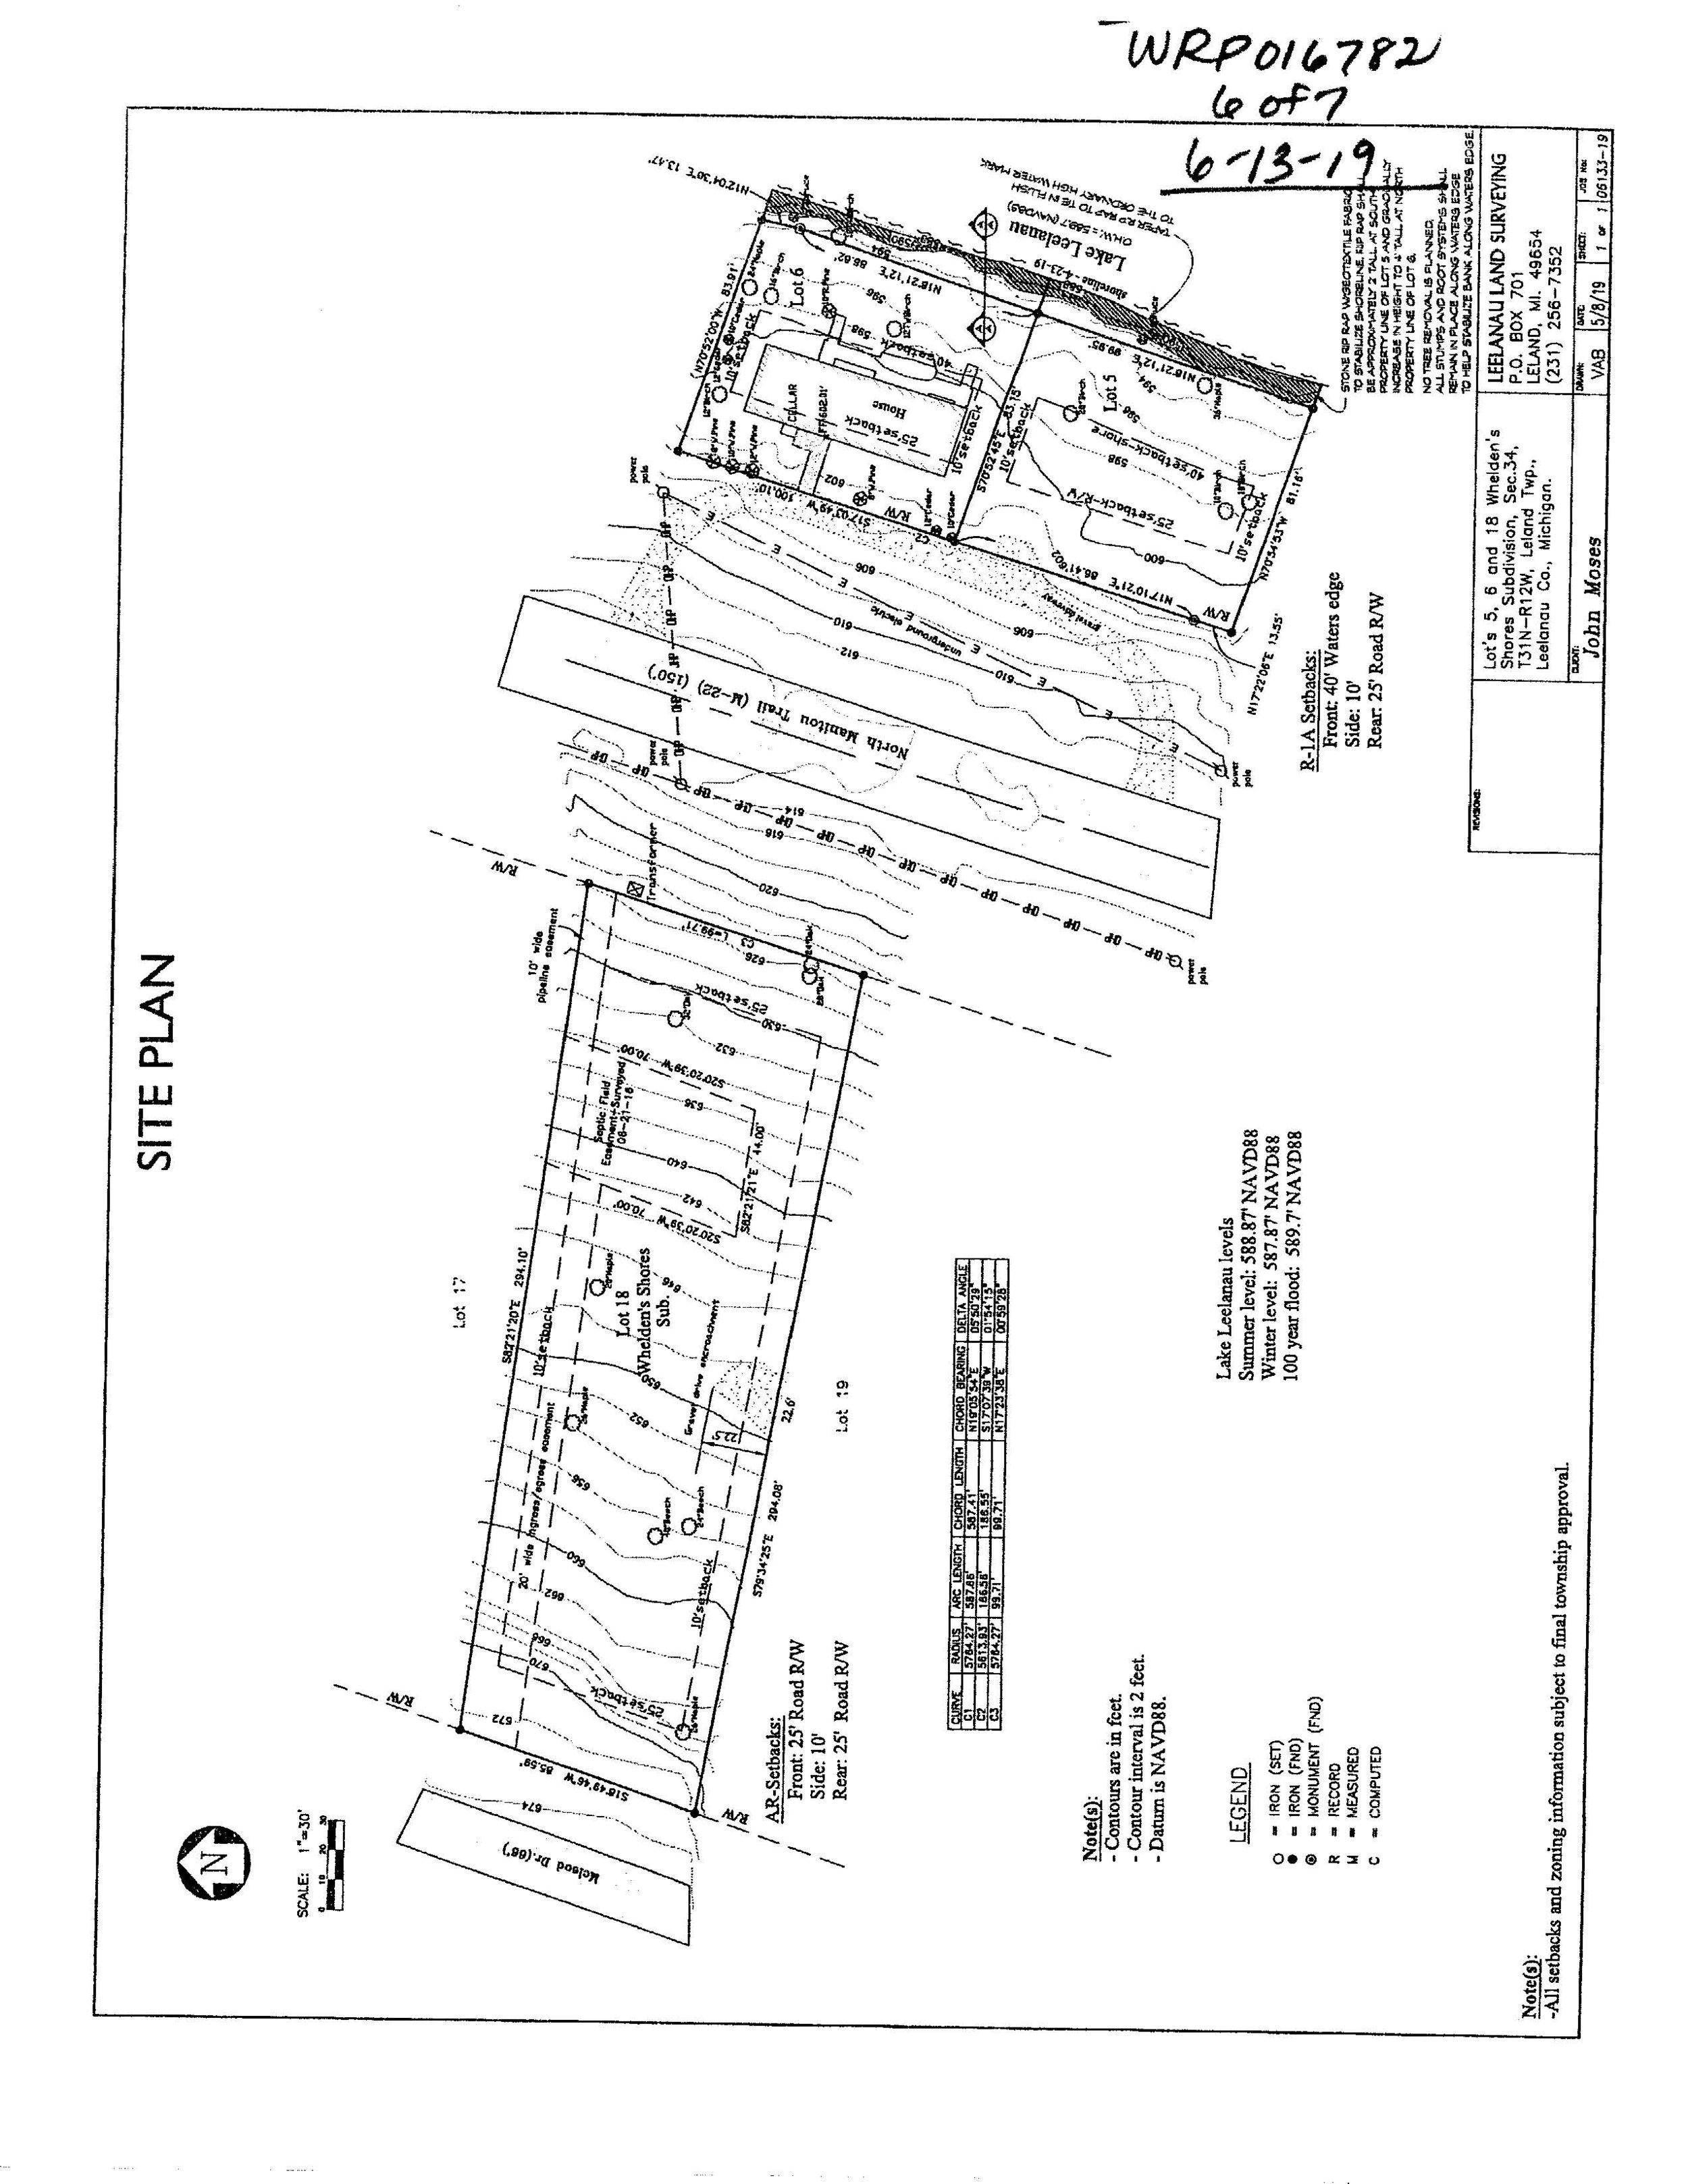 4388 N Manitou Trail, Leland - Marketing packet by Oltersdorf Realty LLC (35).jpg